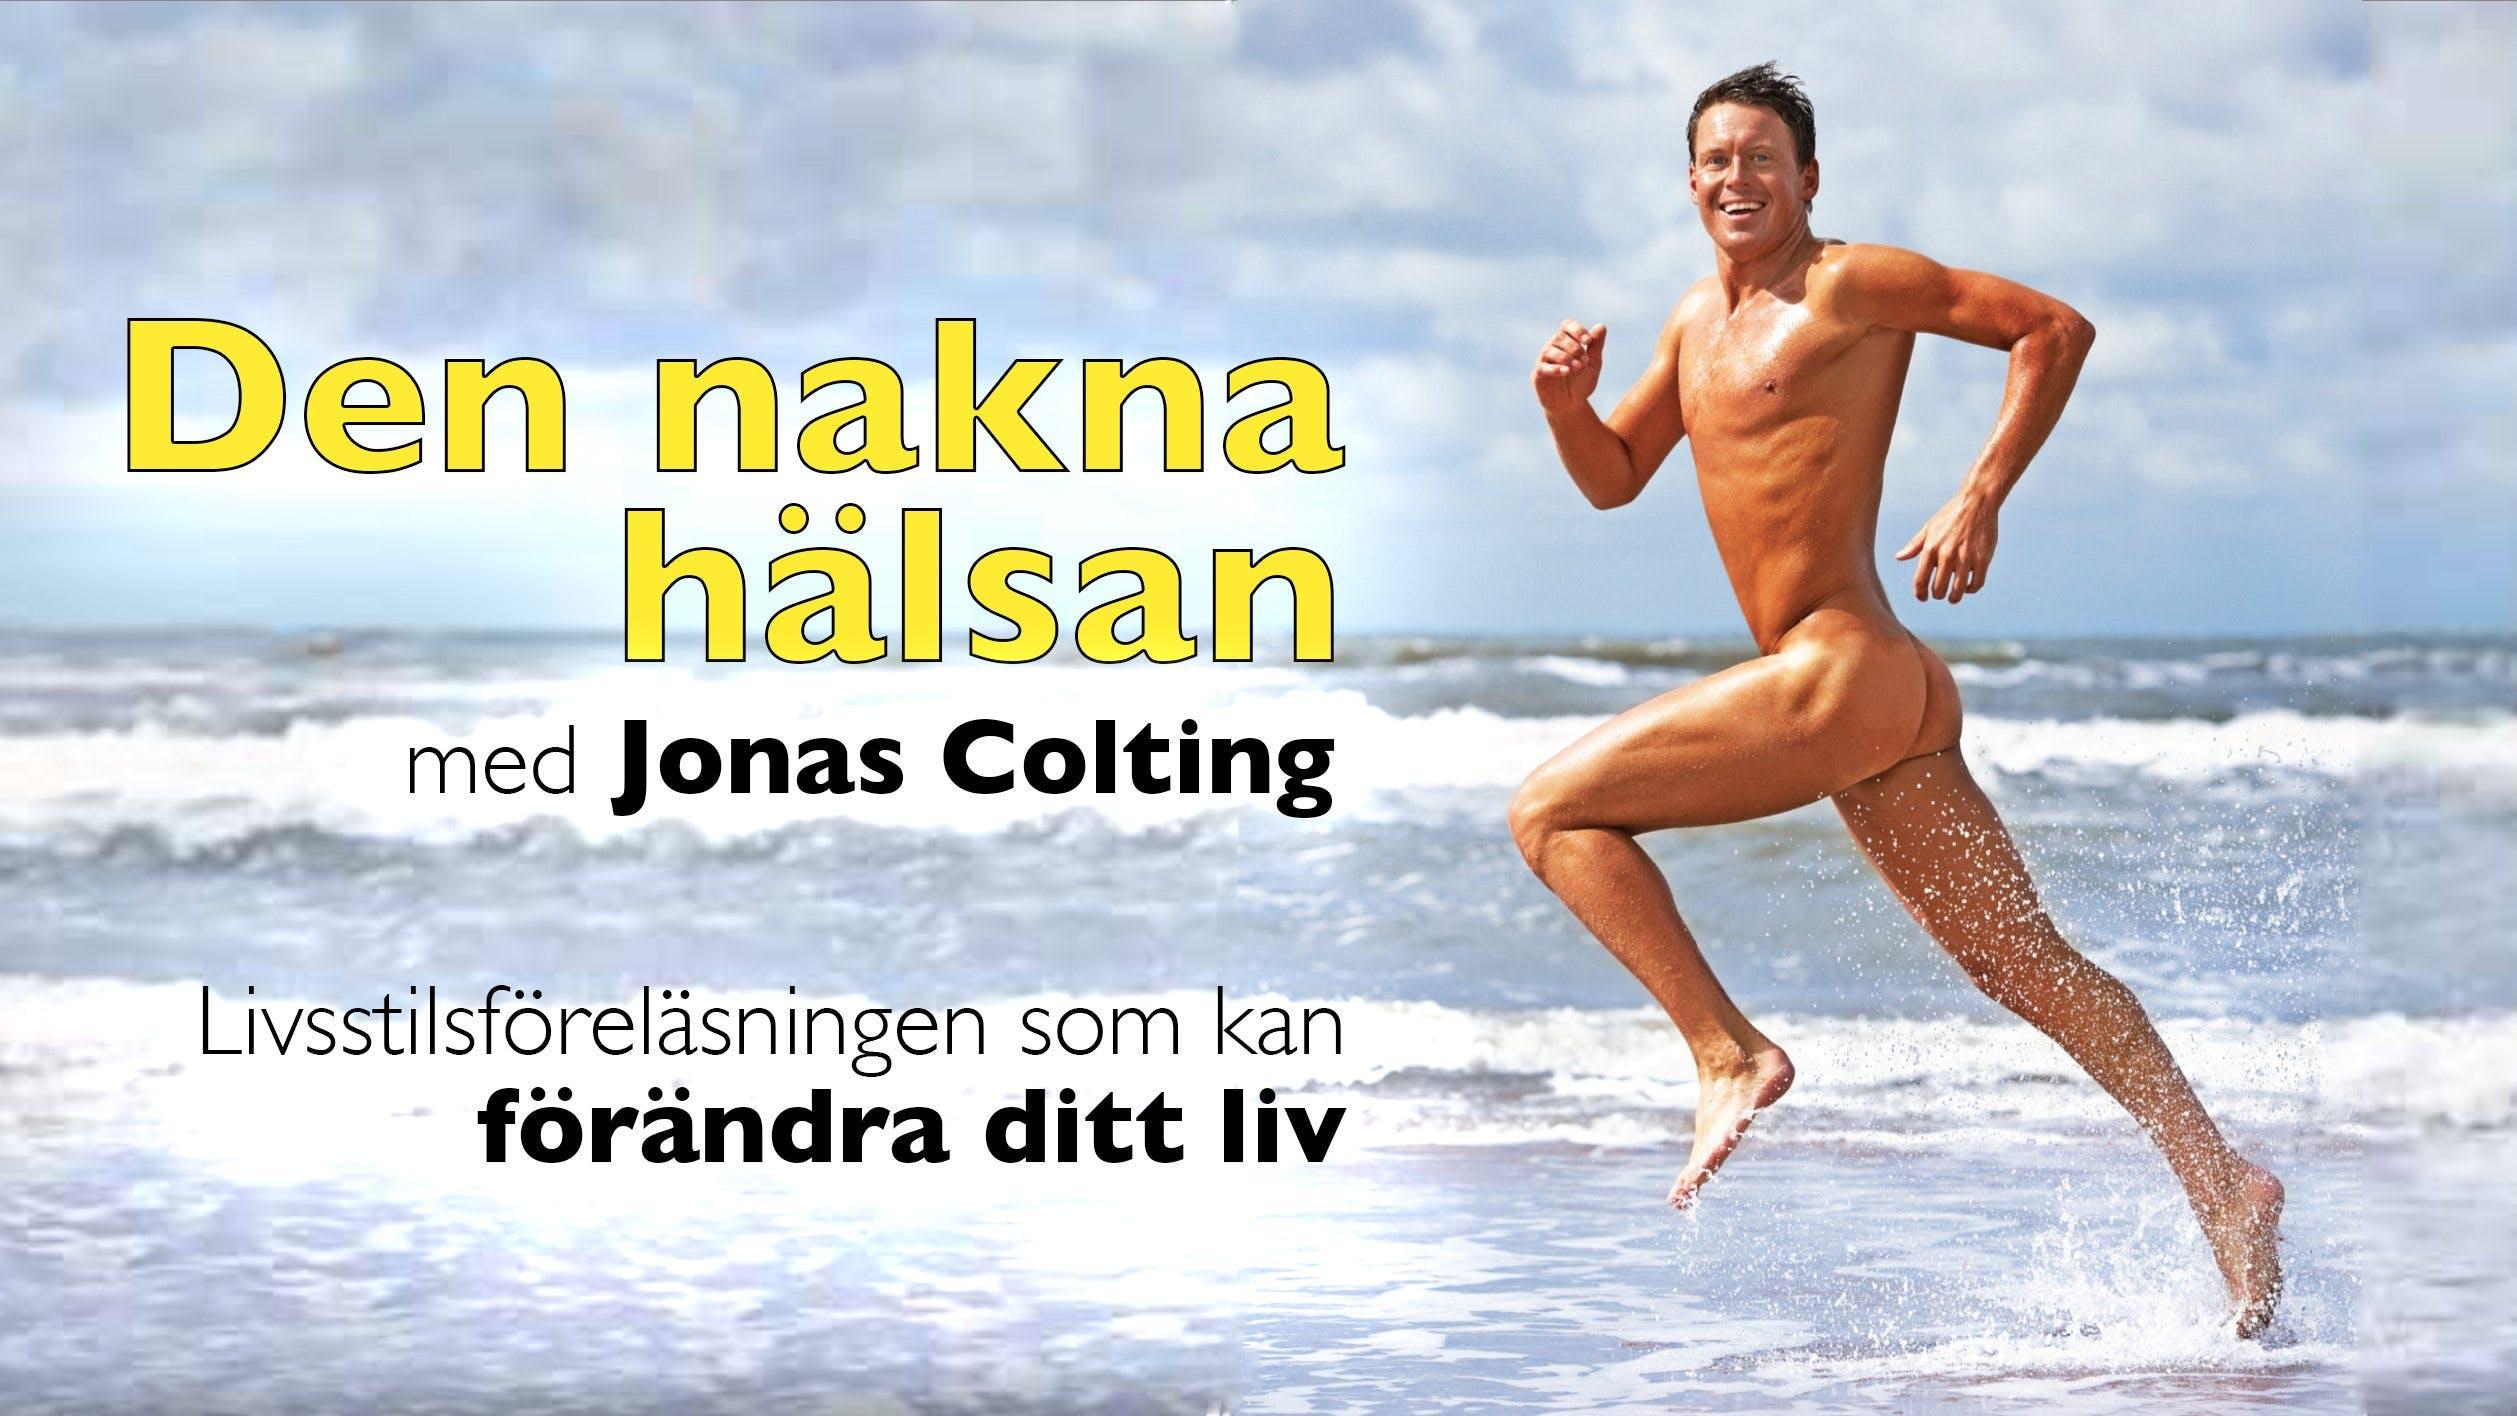 Colting Den nakna hälsan-2015c